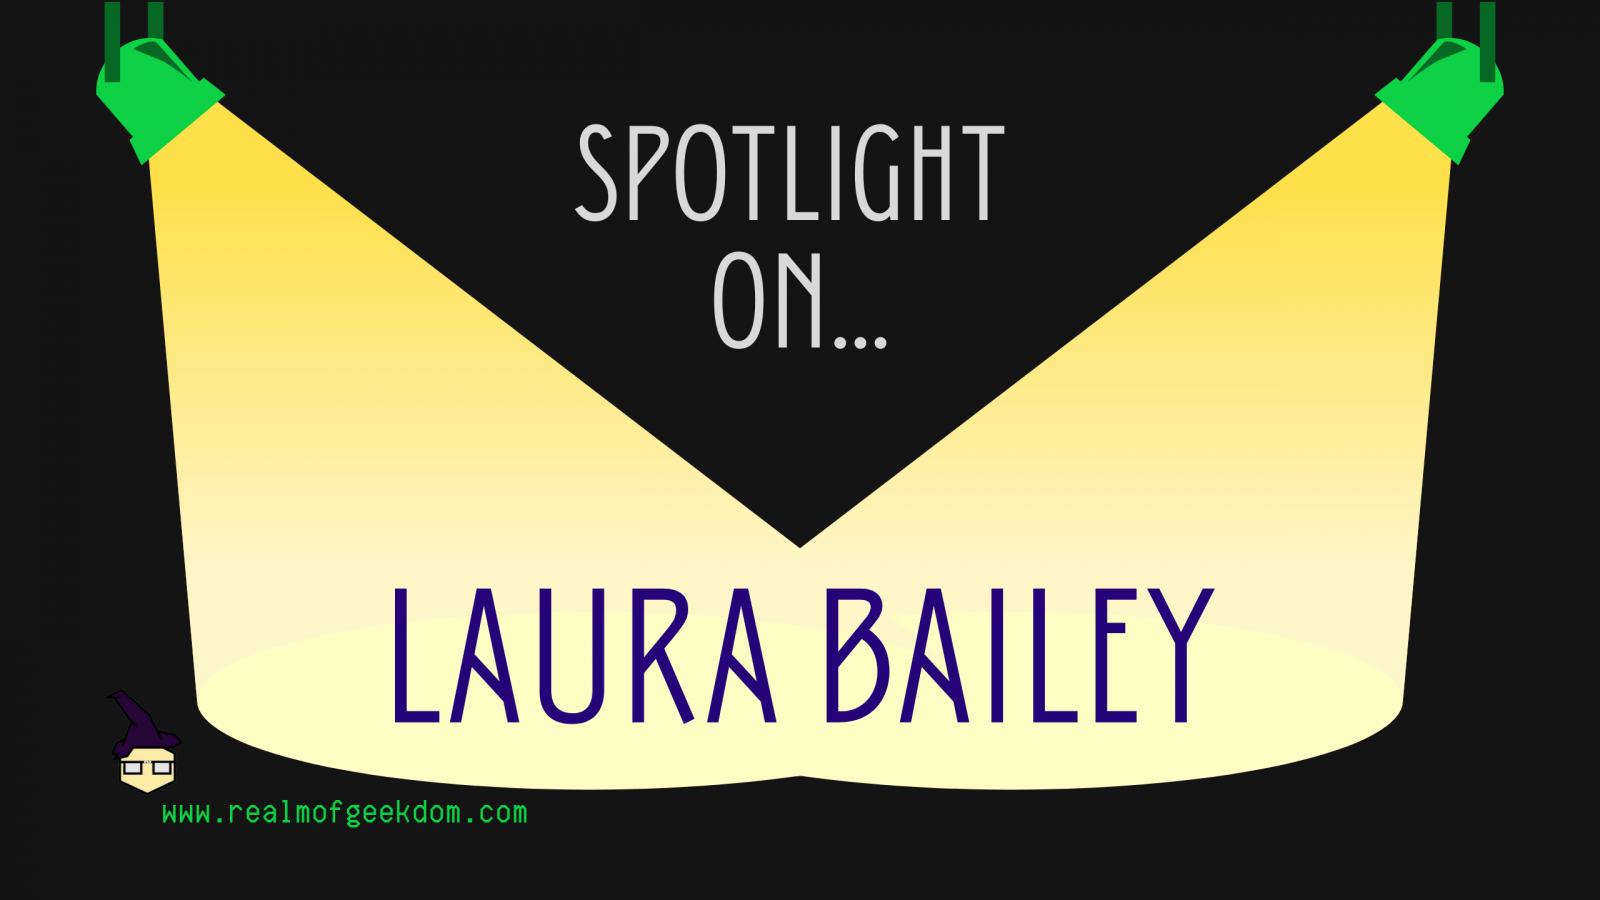 Spotlight on Laura Bailey